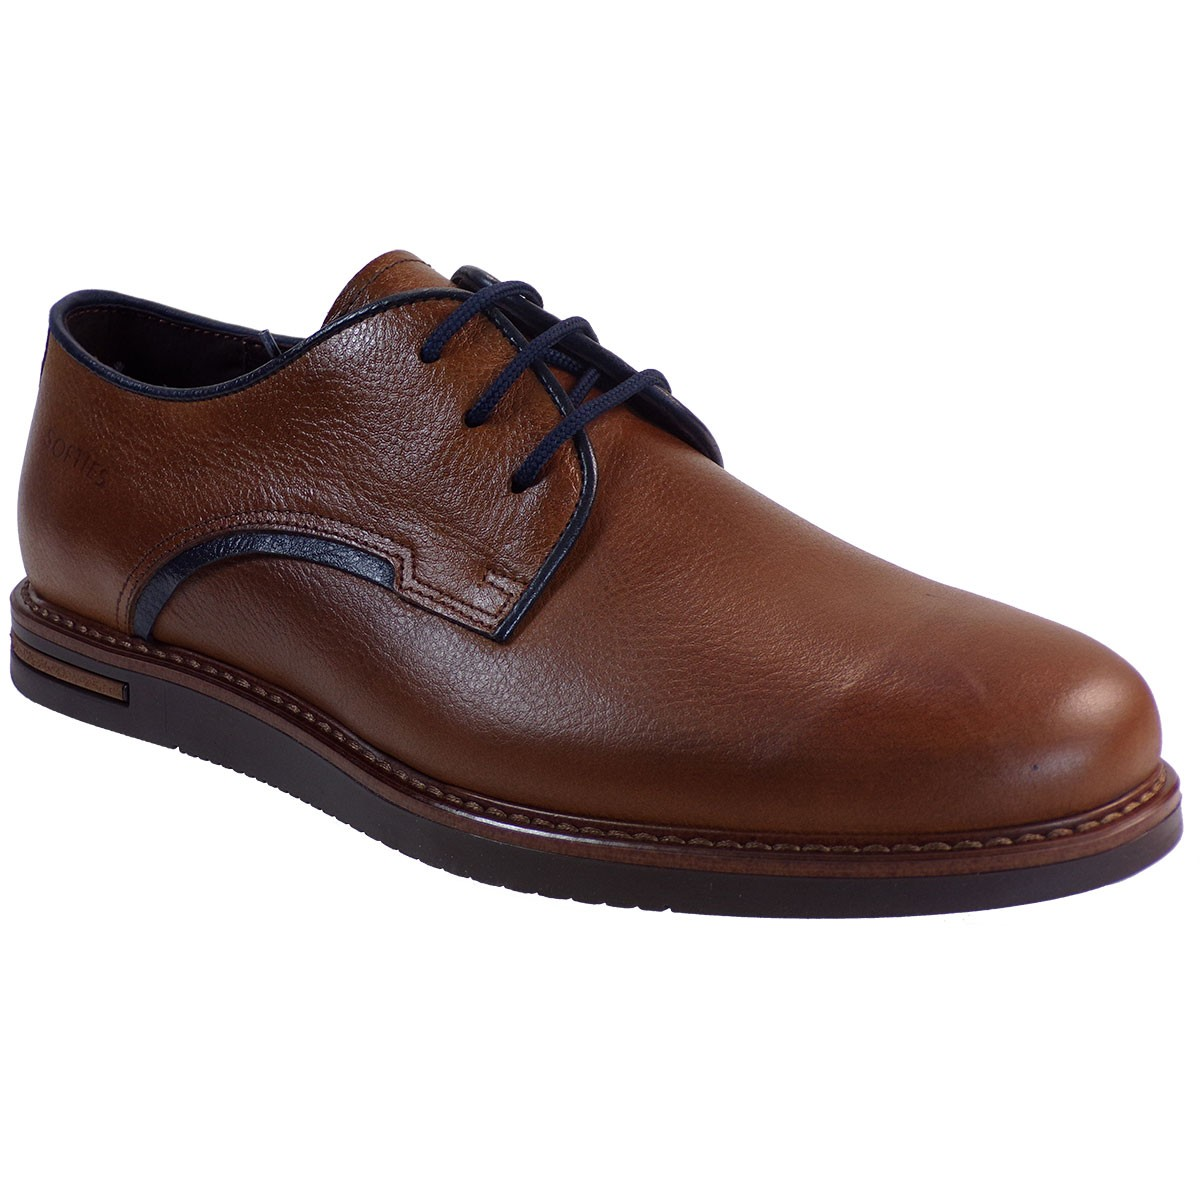 Softies Ανδρικά Παπούτσια Ανατομικά 6971 Ταμπά Δέρμα